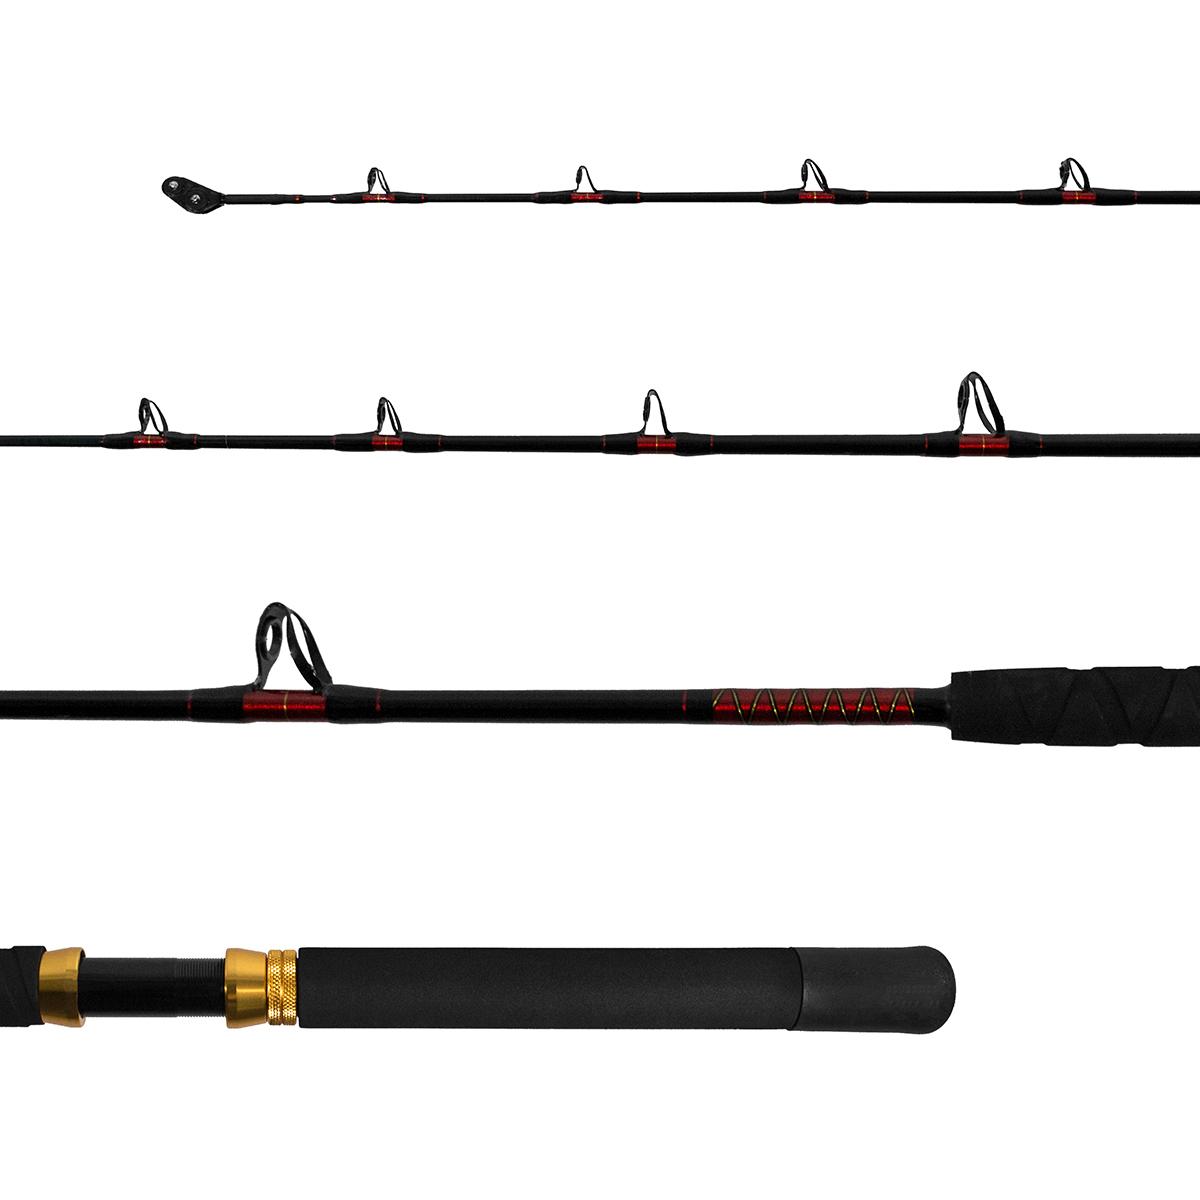 Vara Lumis Extreme Carretilha 1,83m 100-200lb Inteiriça  - Pesca Adventure